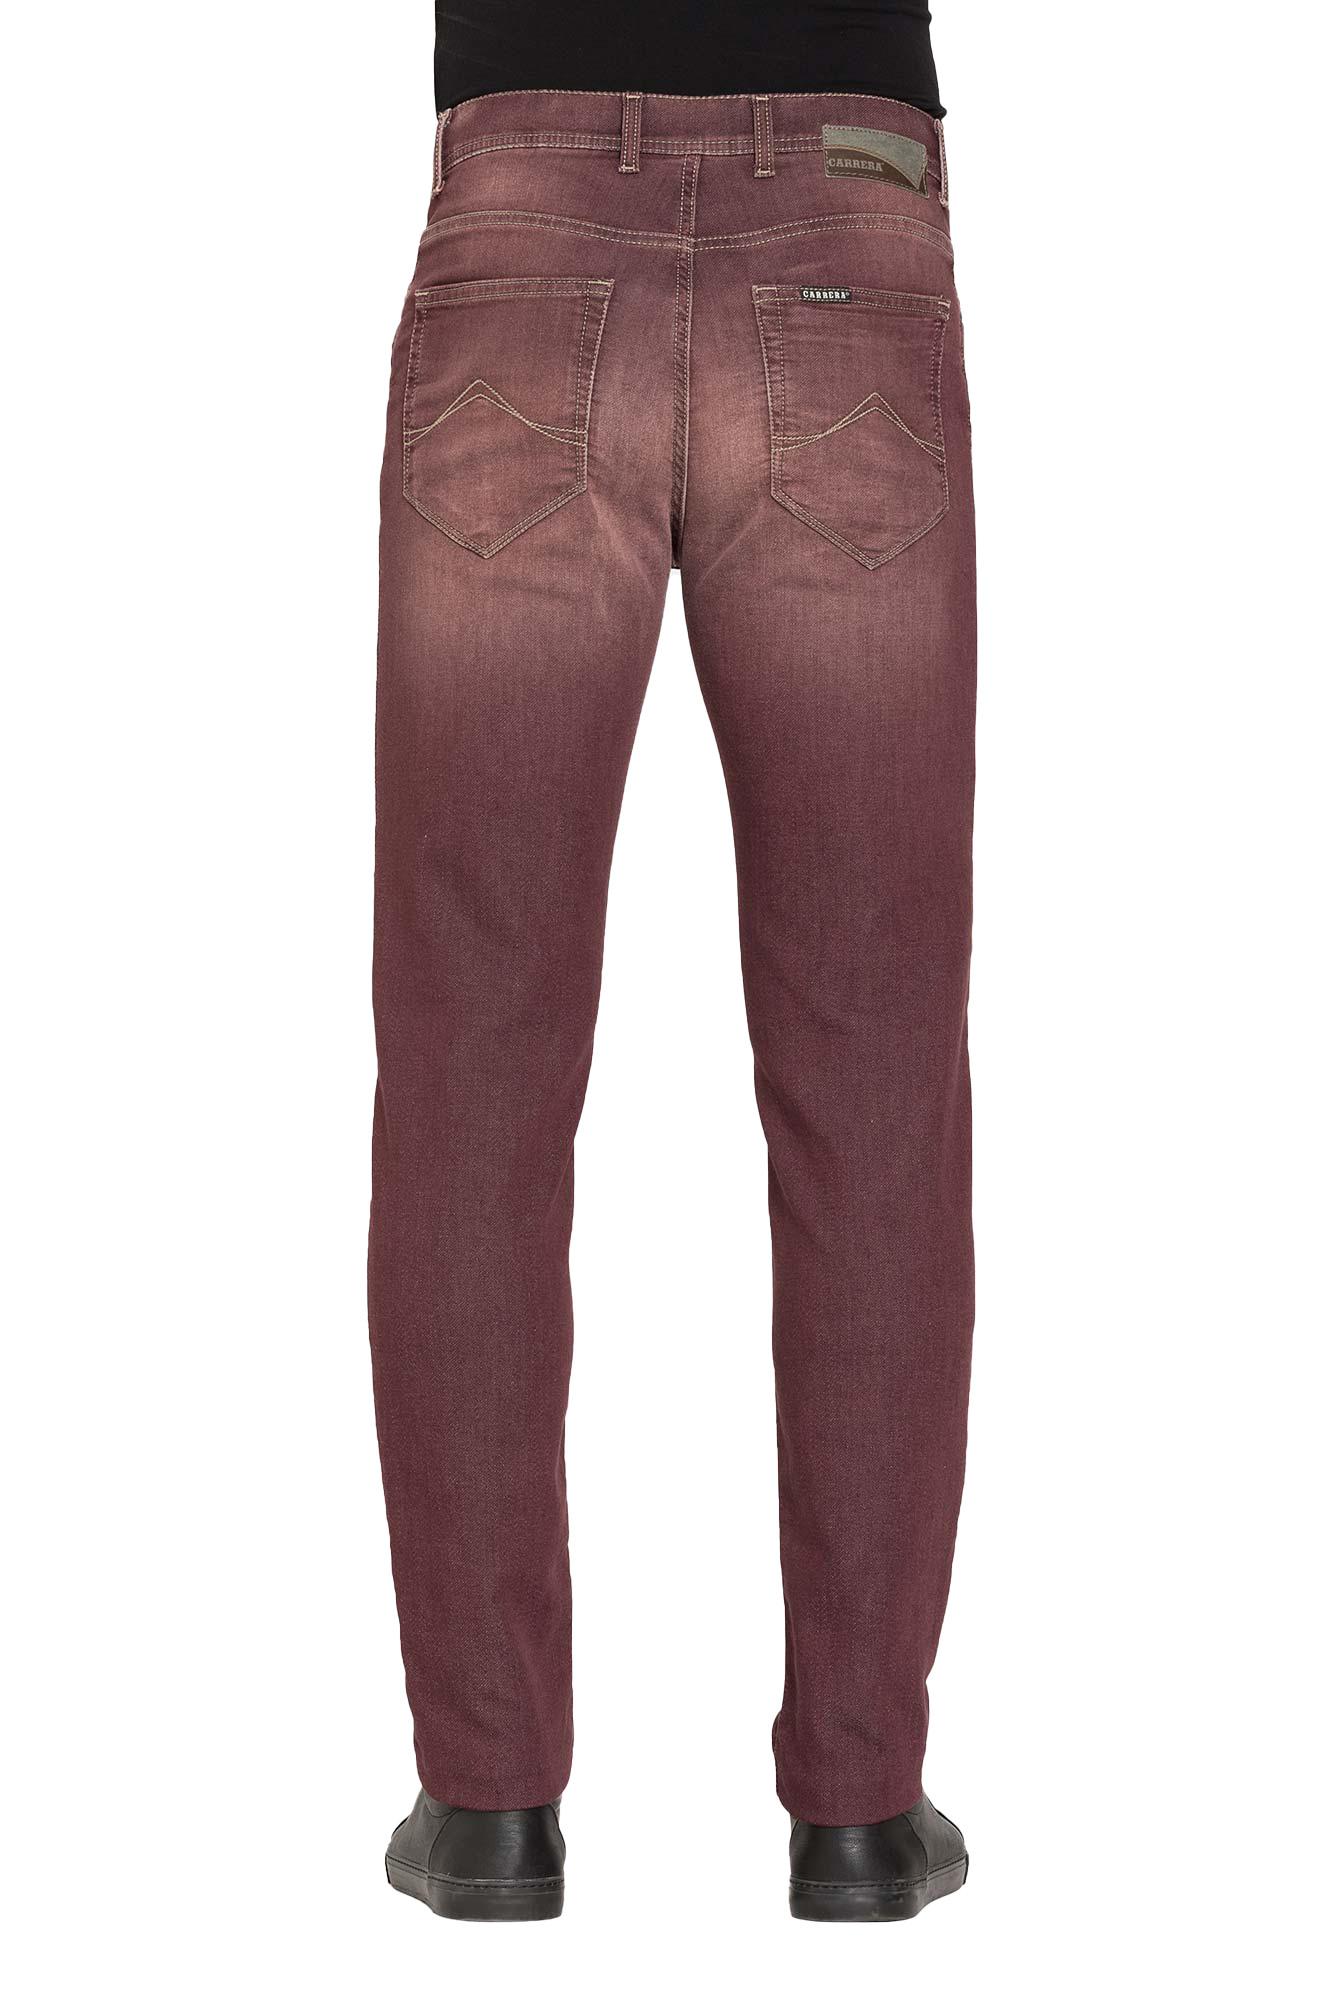 Carrera-Jeans-Jeans-per-uomo-tinta-unita miniatura 10